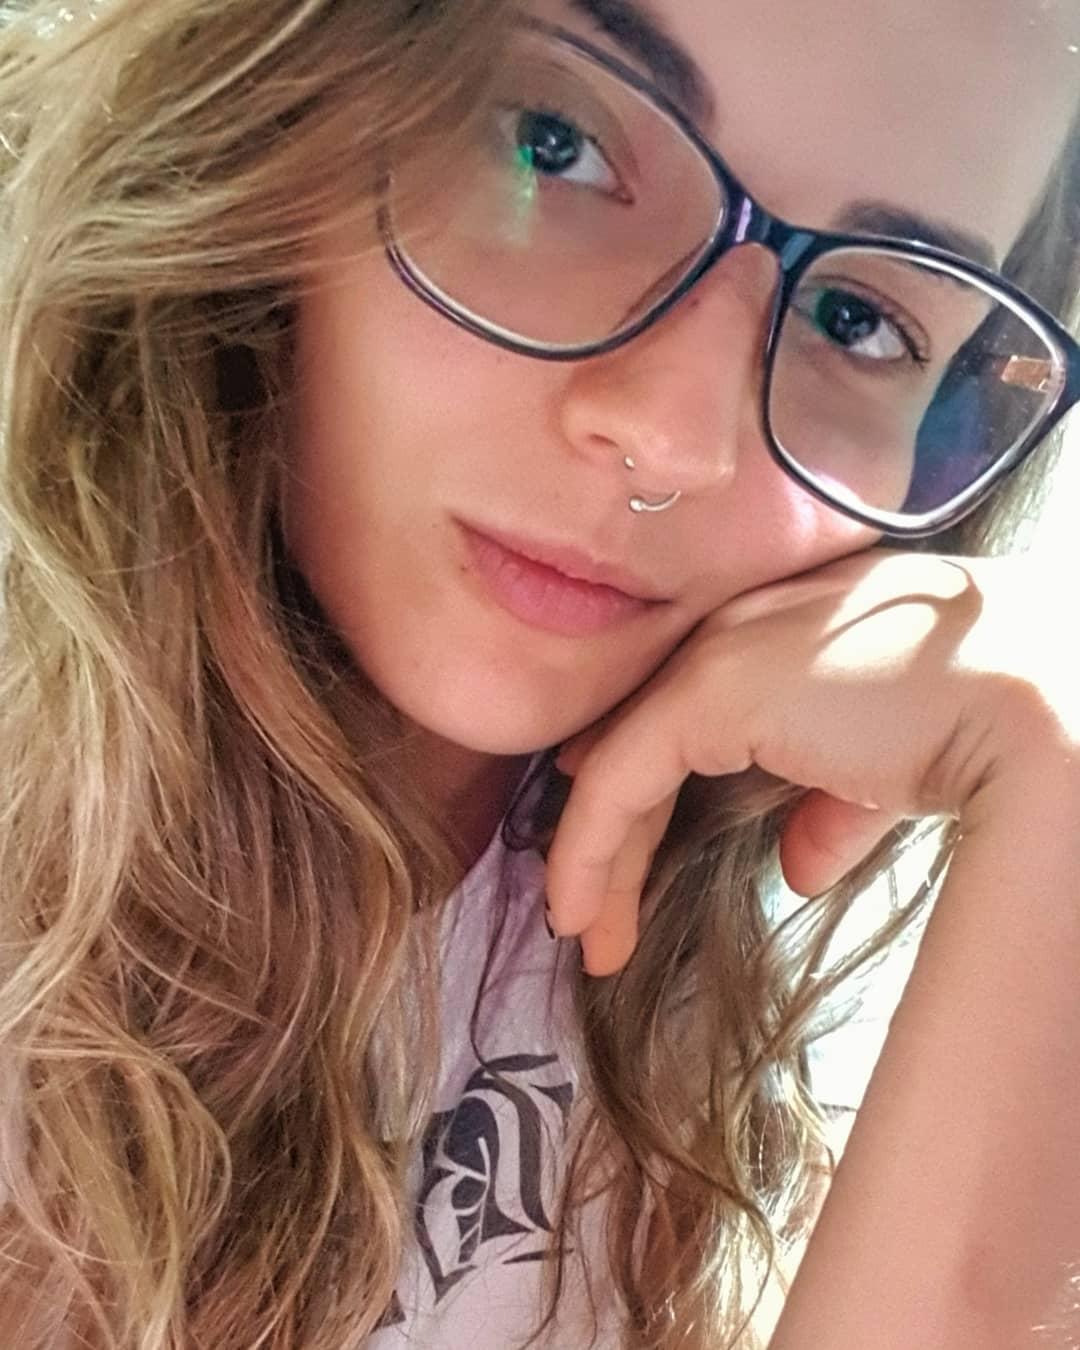 Vanessa-Garcia-Wallpapers-Insta-Fit-Bio-1